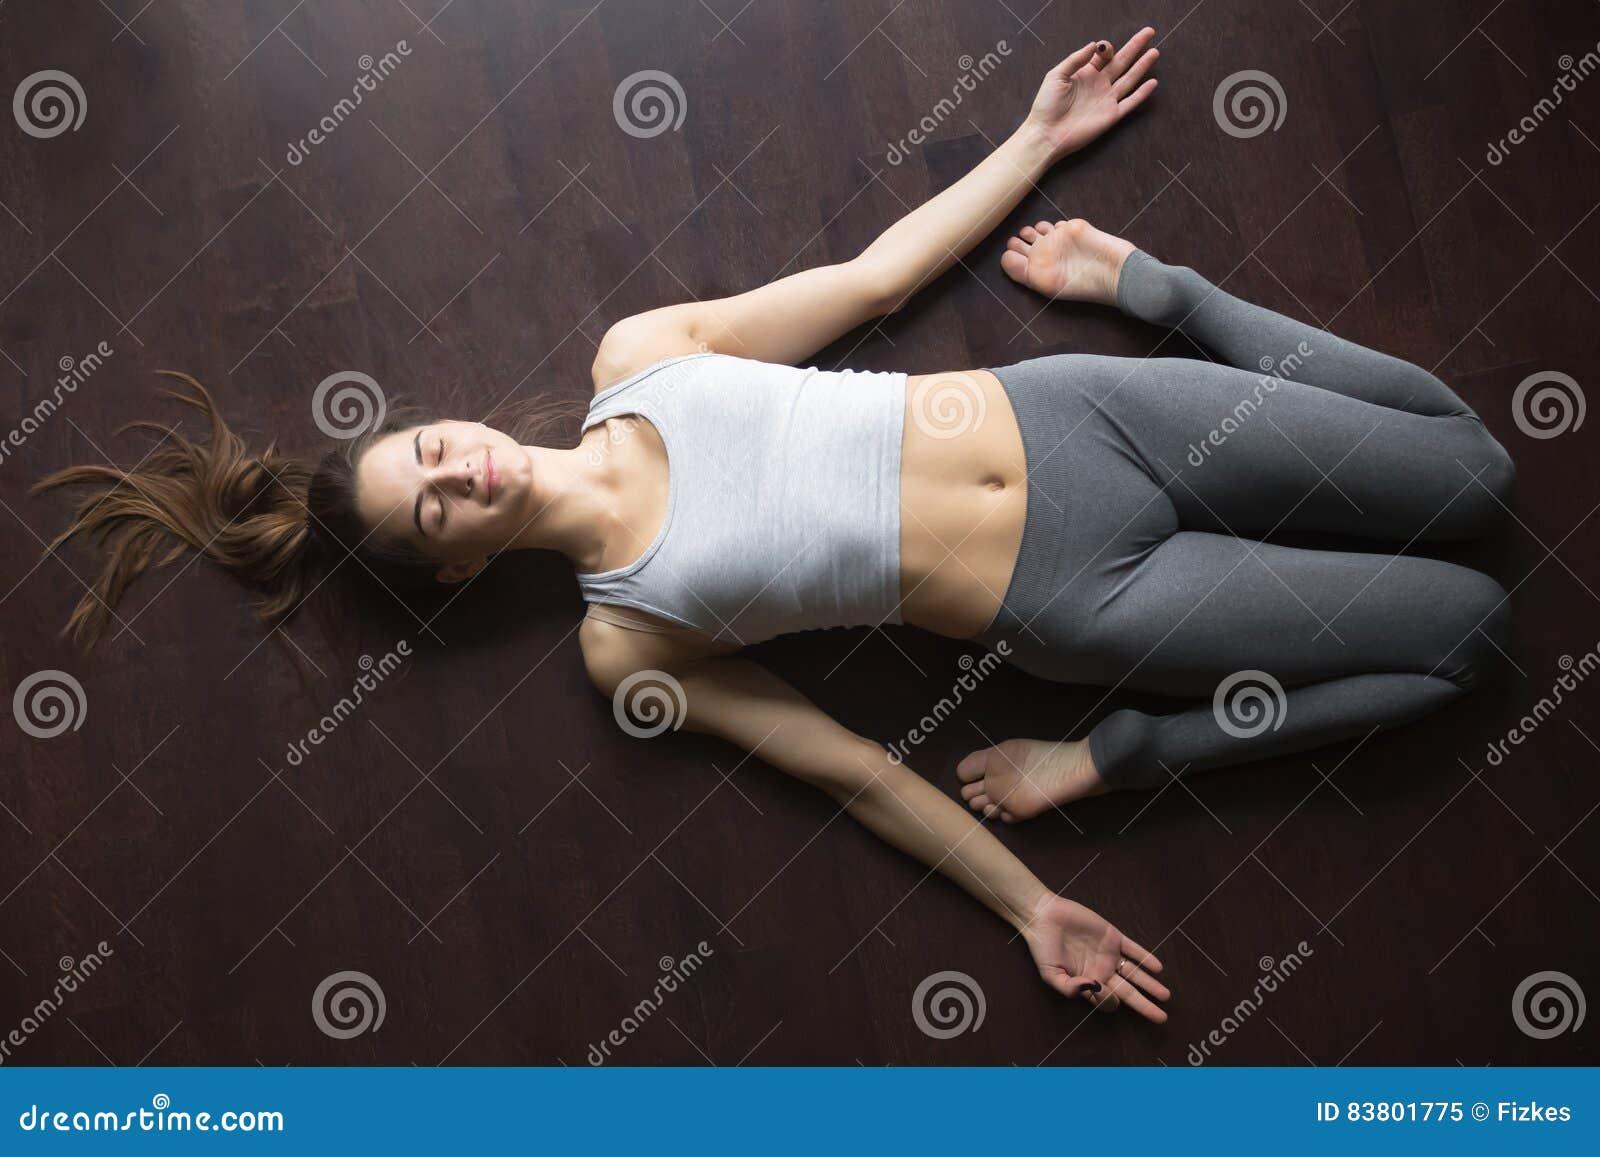 Top View Of Reclining Hero Yoga Posture Stock Image   Image Of High, Floor:  83801775